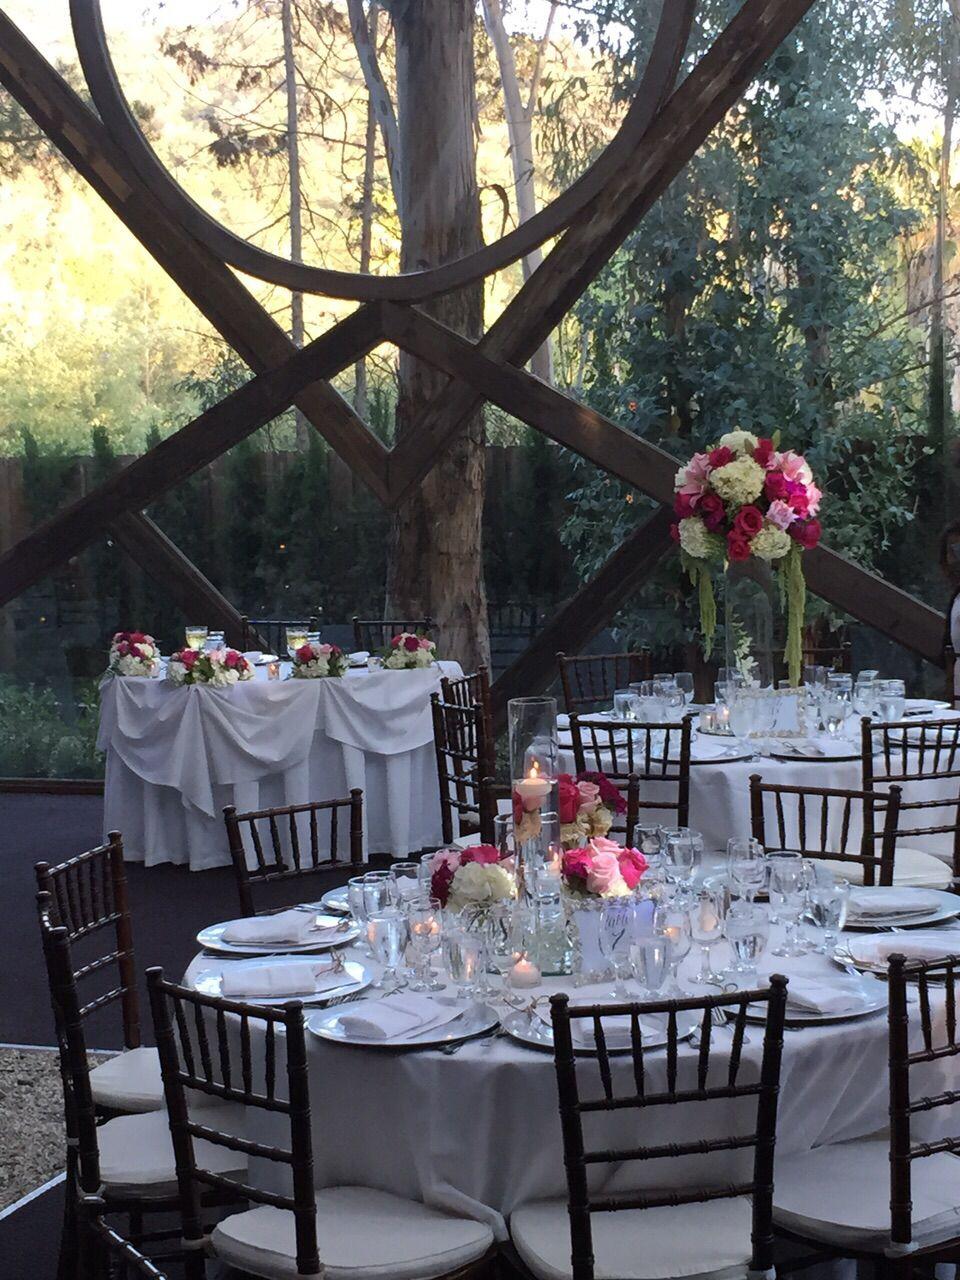 The Oak Room calamigosranch malibu Wedding